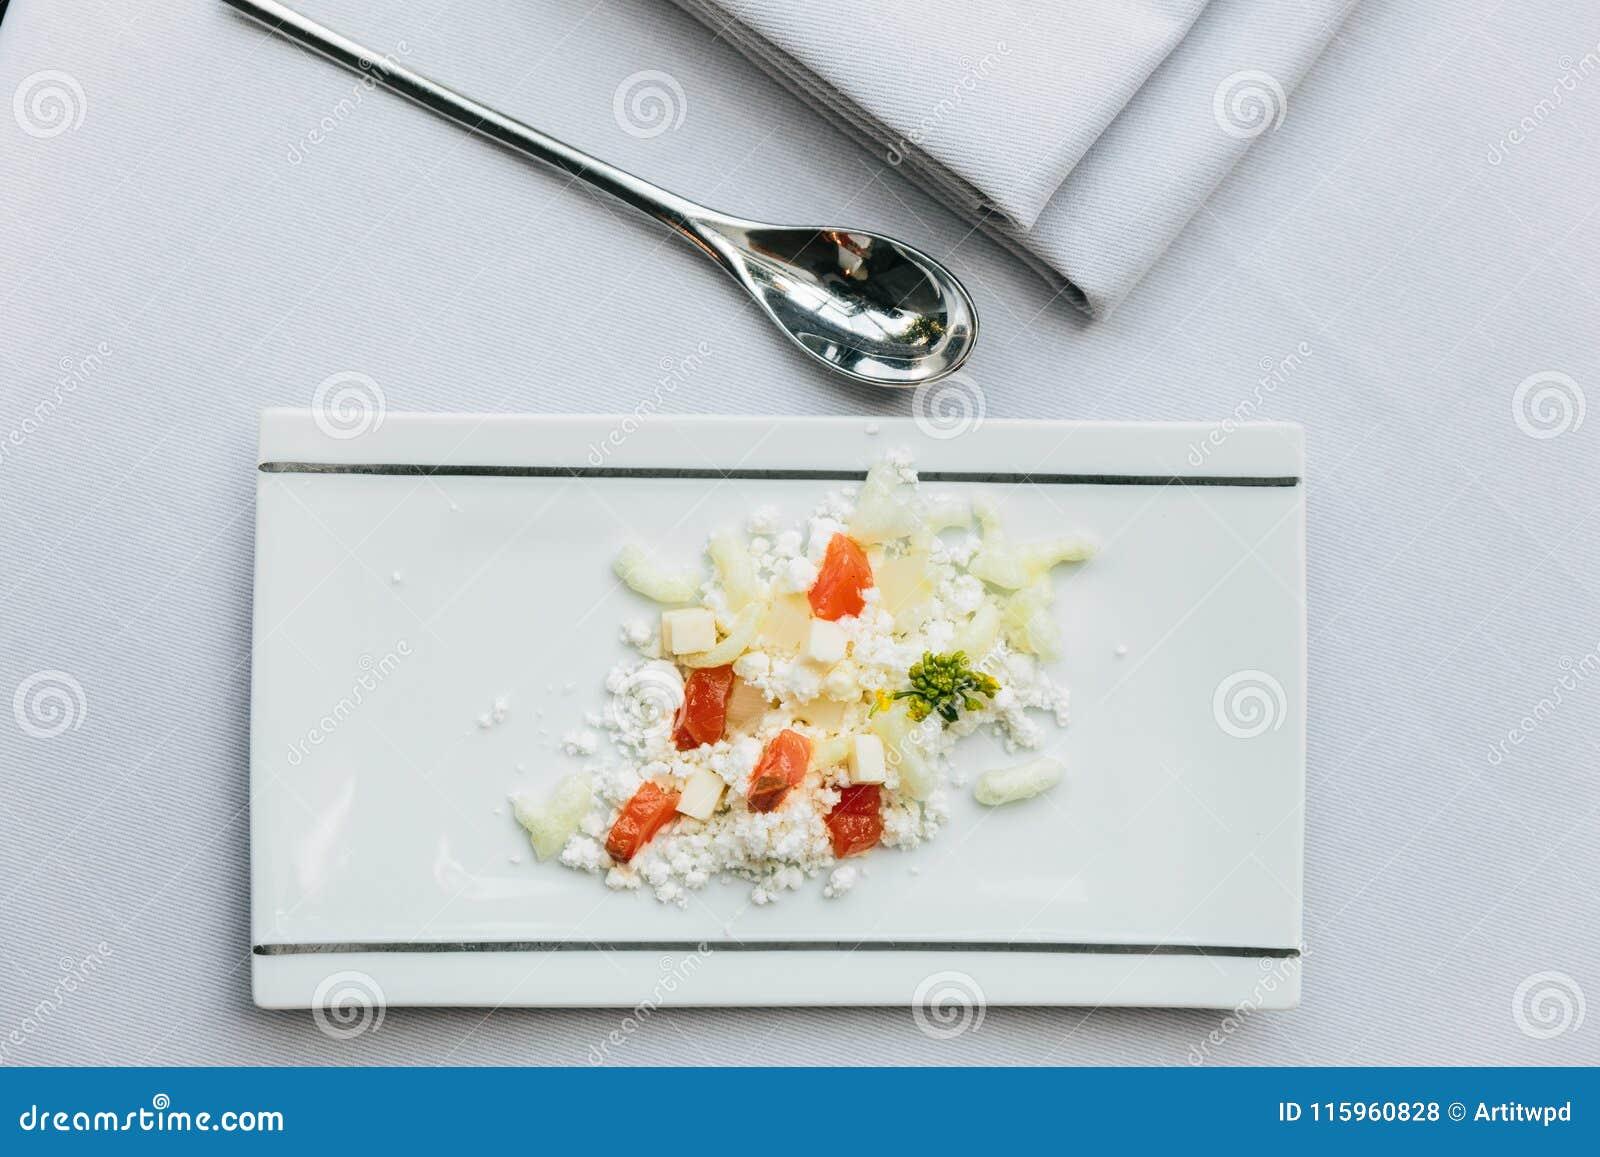 Modern Frans voorgerecht: verbrijzeling en besnoeiingskaas met gedobbelde tomaat diende op witte rechthoekplaat met zilveren lepe